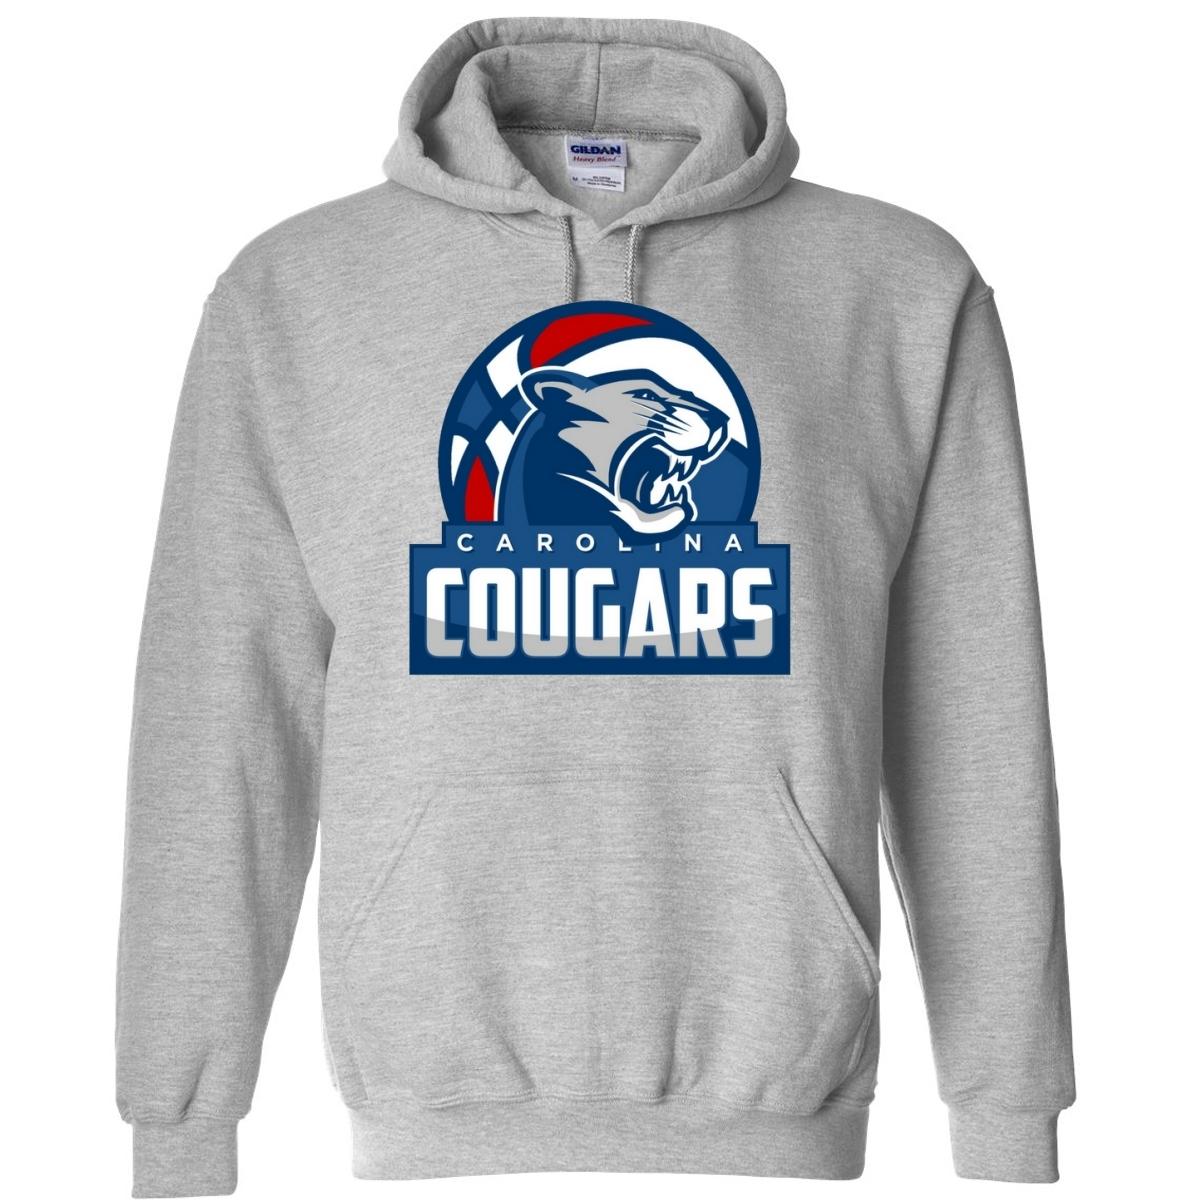 00009 BASKETBALL ABA Carolina Cougars Hoodie